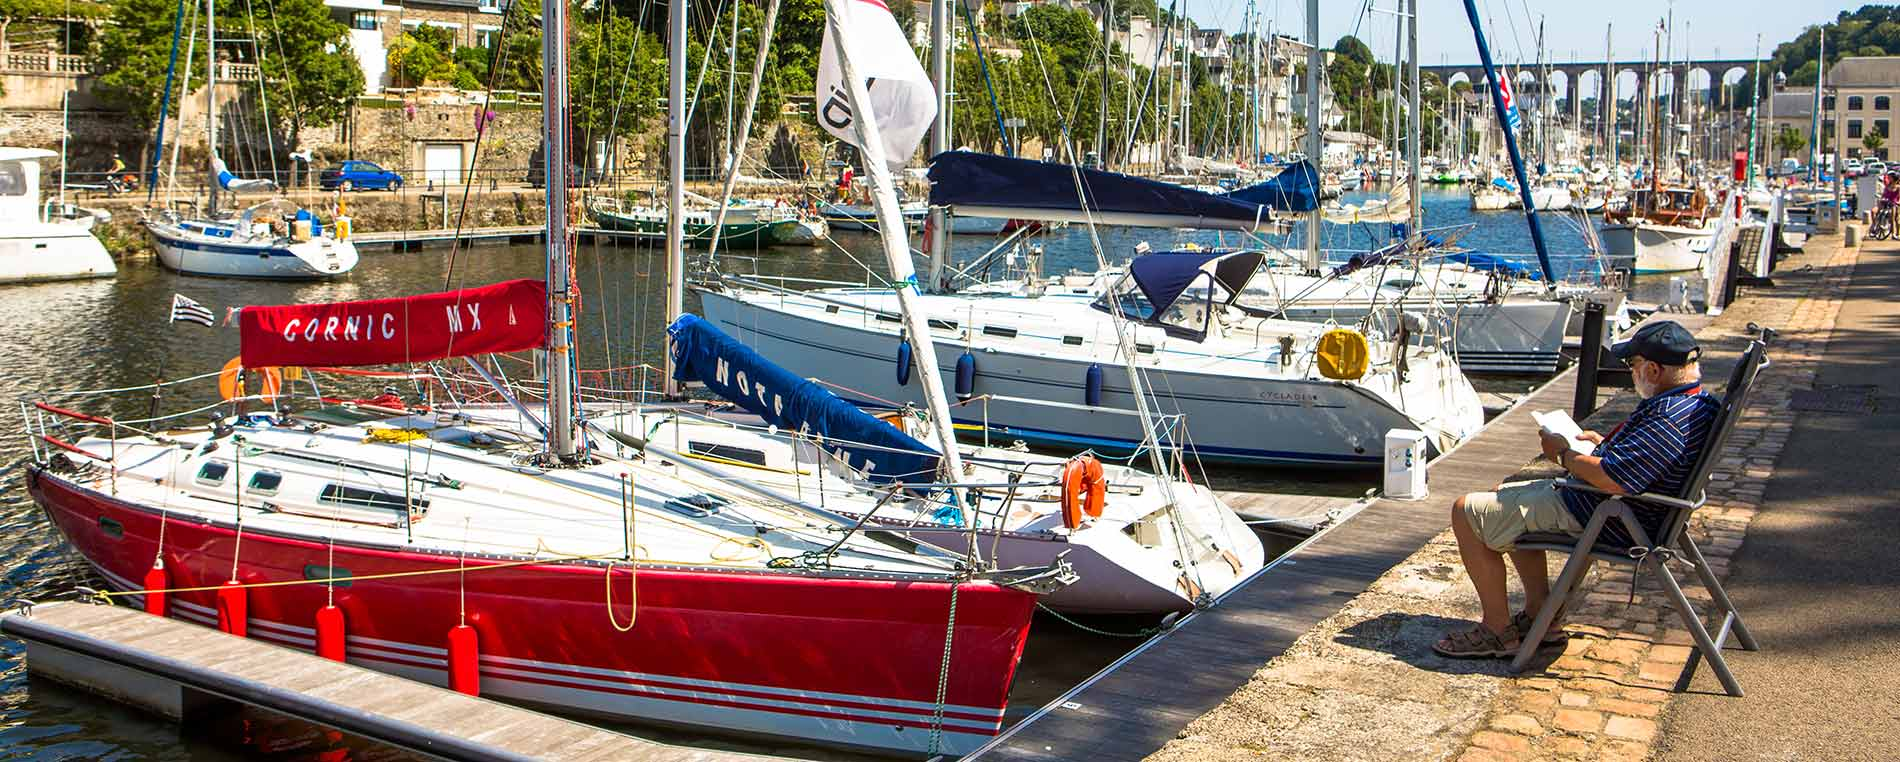 Morlaix : un port en coeur de ville